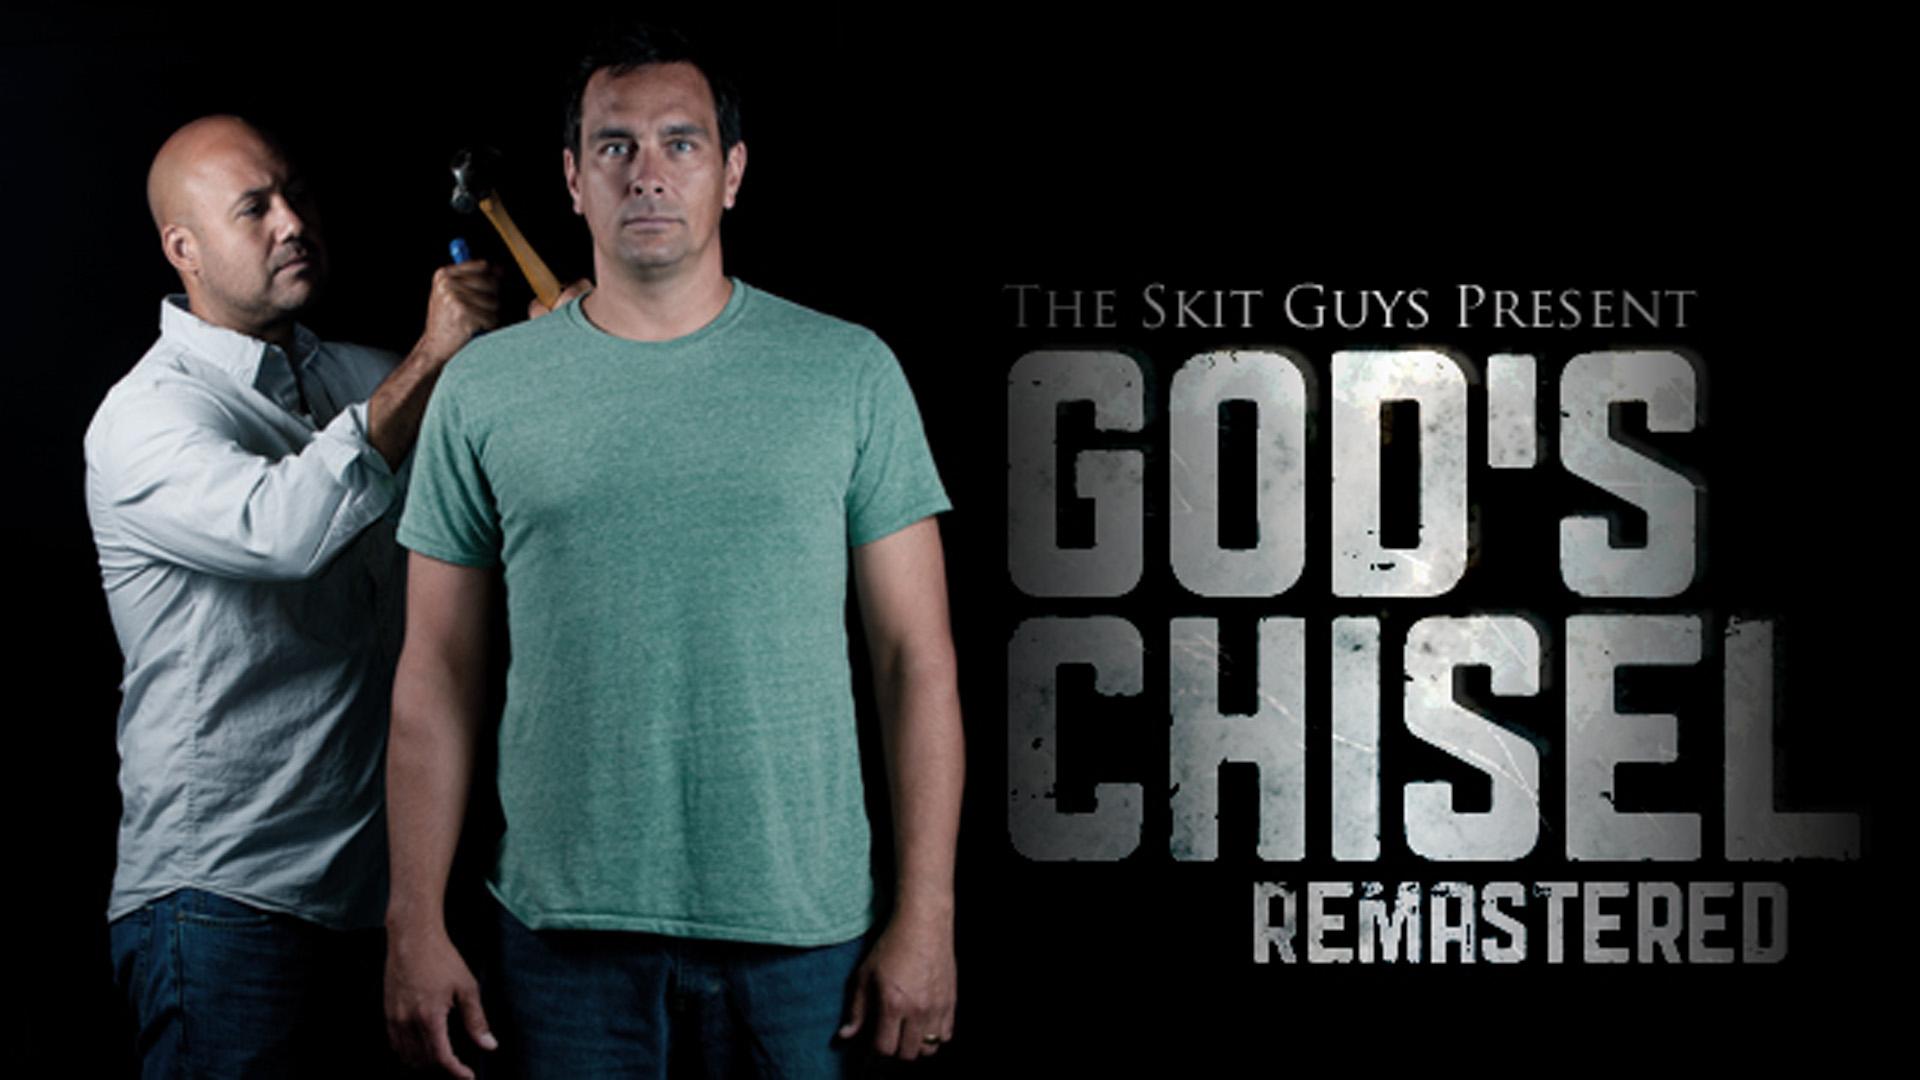 God's Chisel Remastered